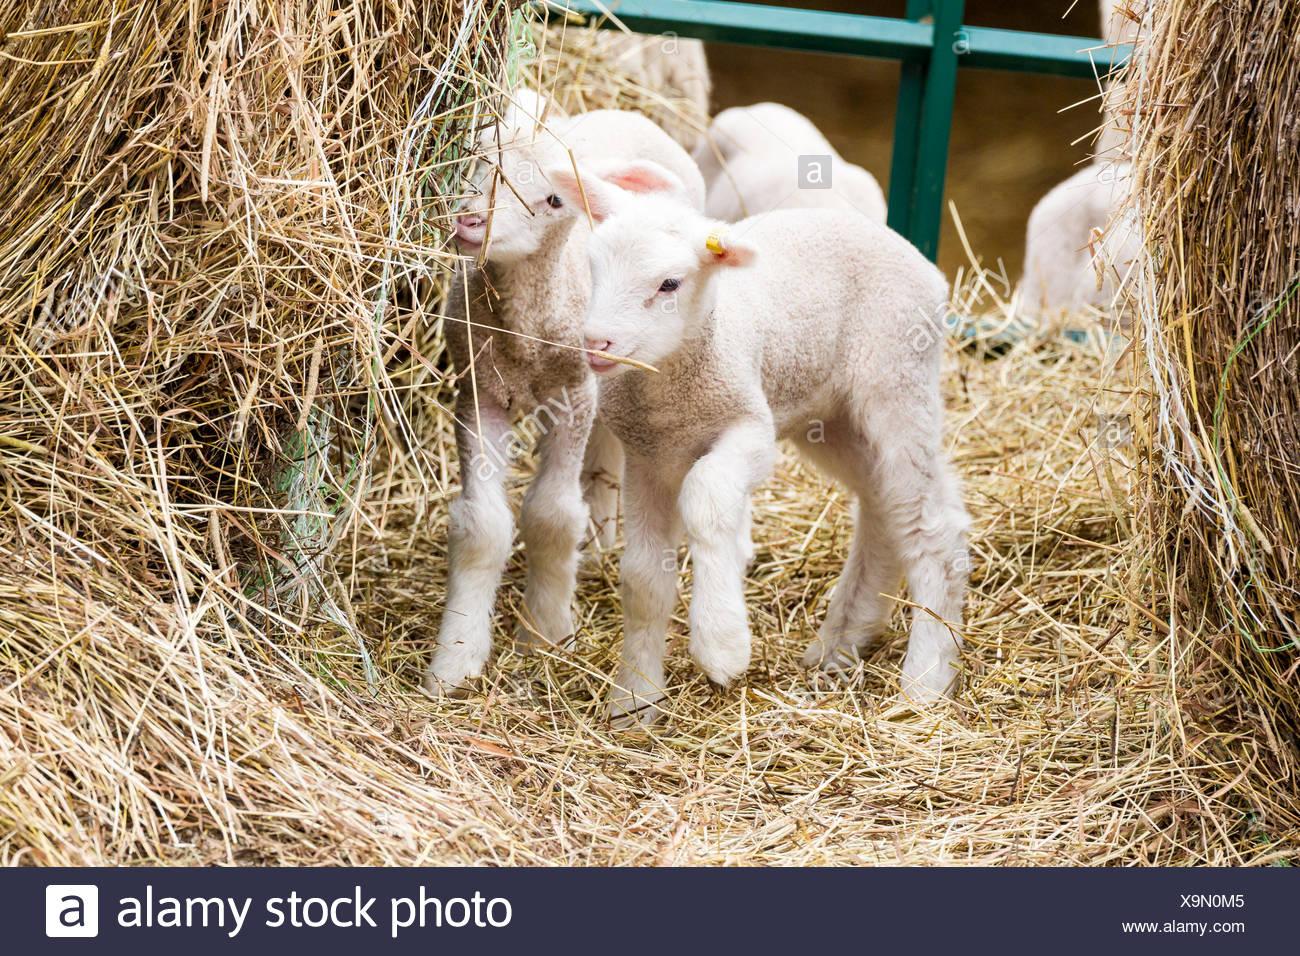 Lambs in Prince Edward County, Ontario, Canada - Stock Image